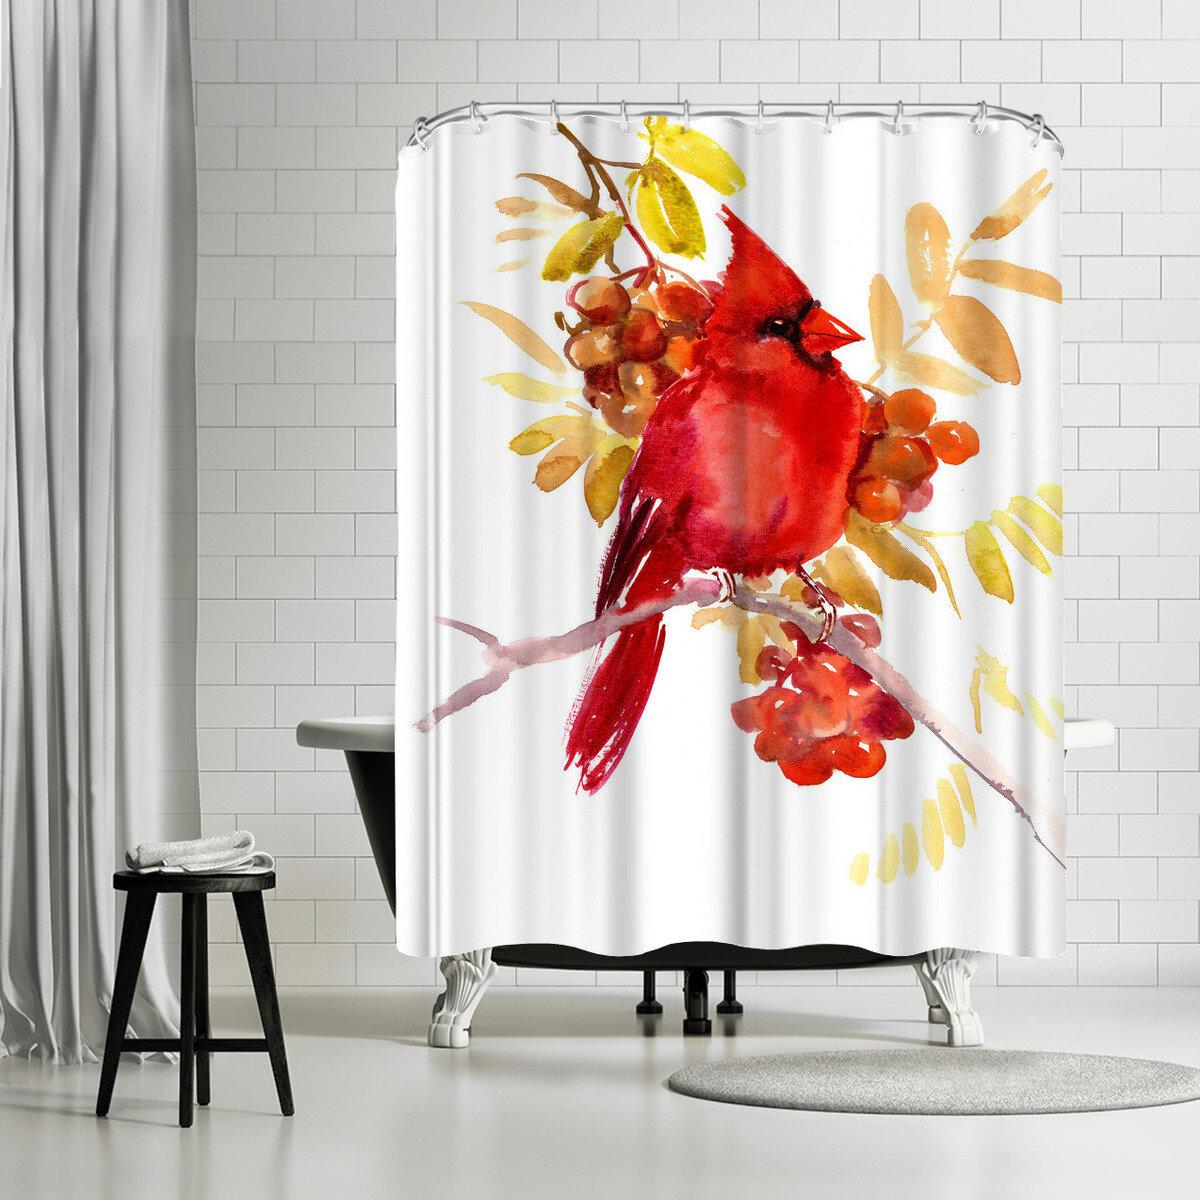 East Urban Home Suren Nersisyan Bird 4 Single Shower Curtain Wayfair